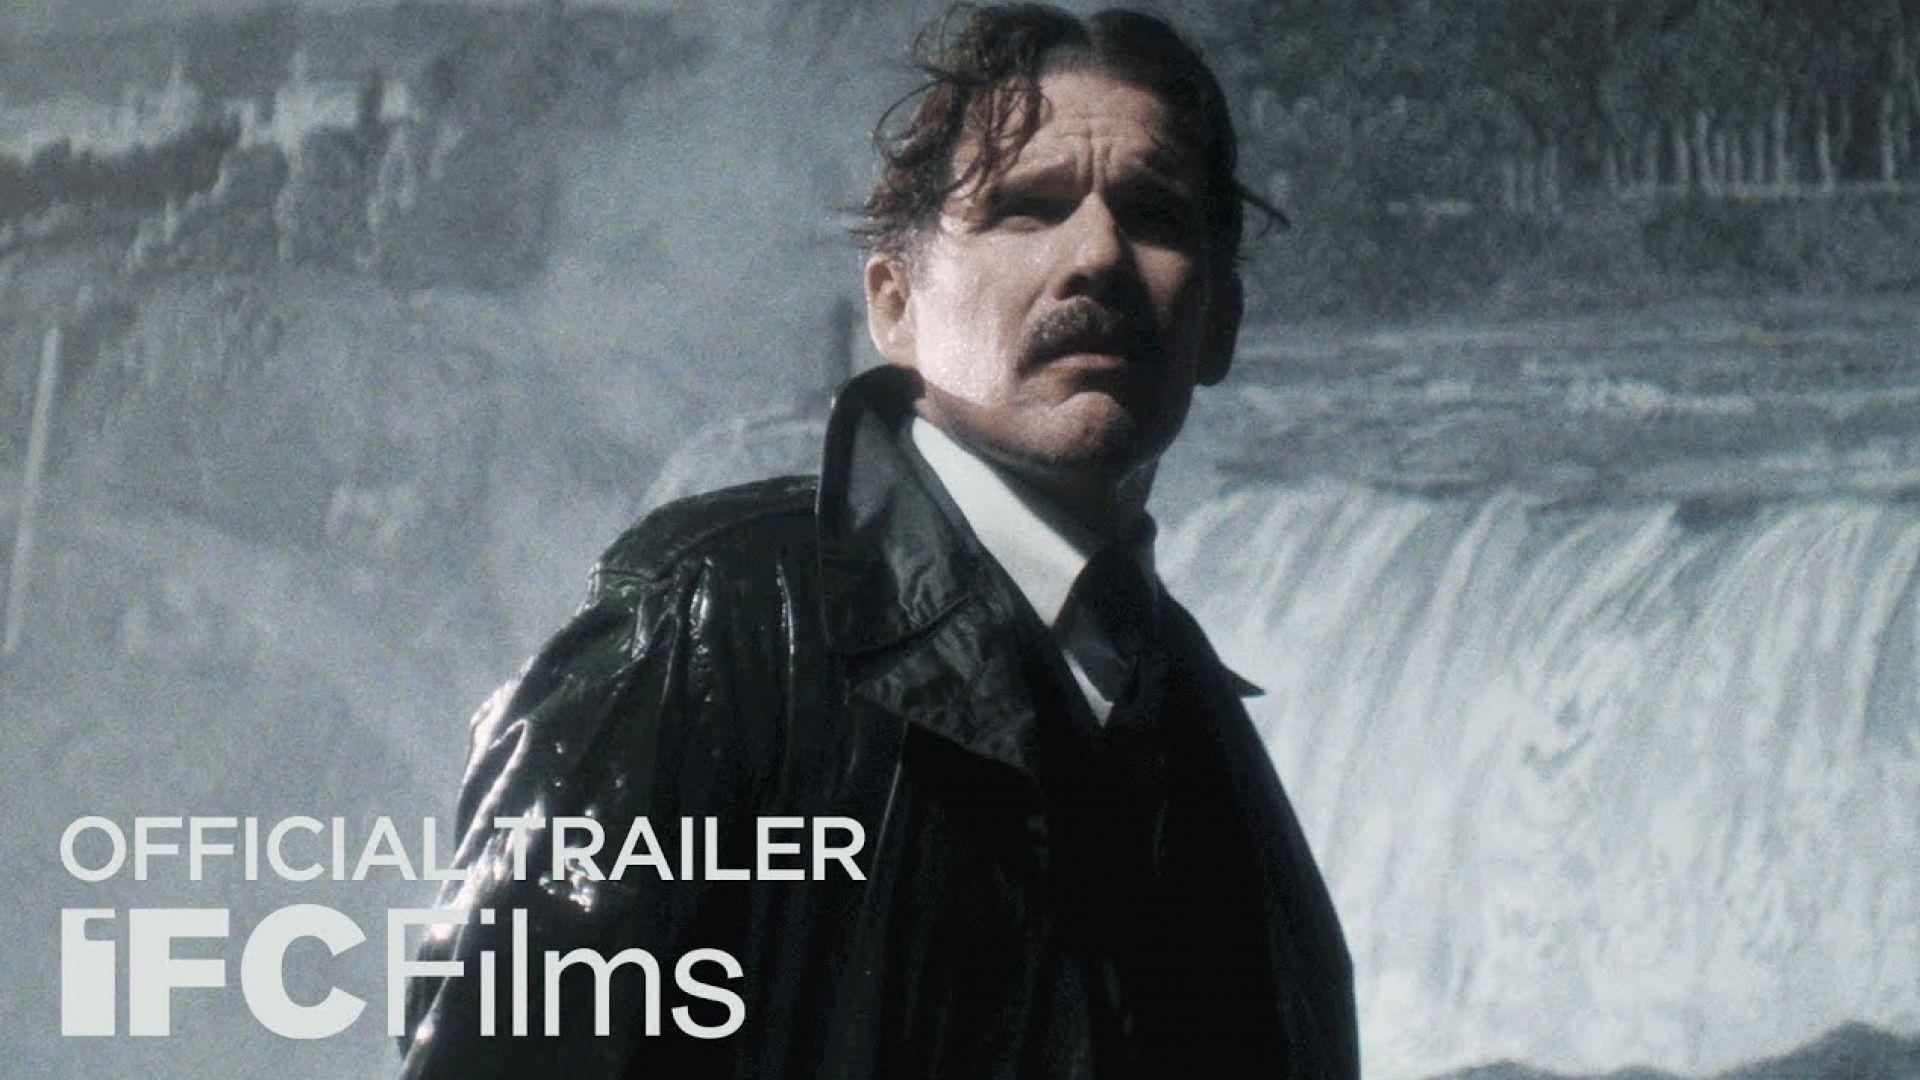 'Tesla' Trailer - Ethan Hawke, Kyle MacLachlan